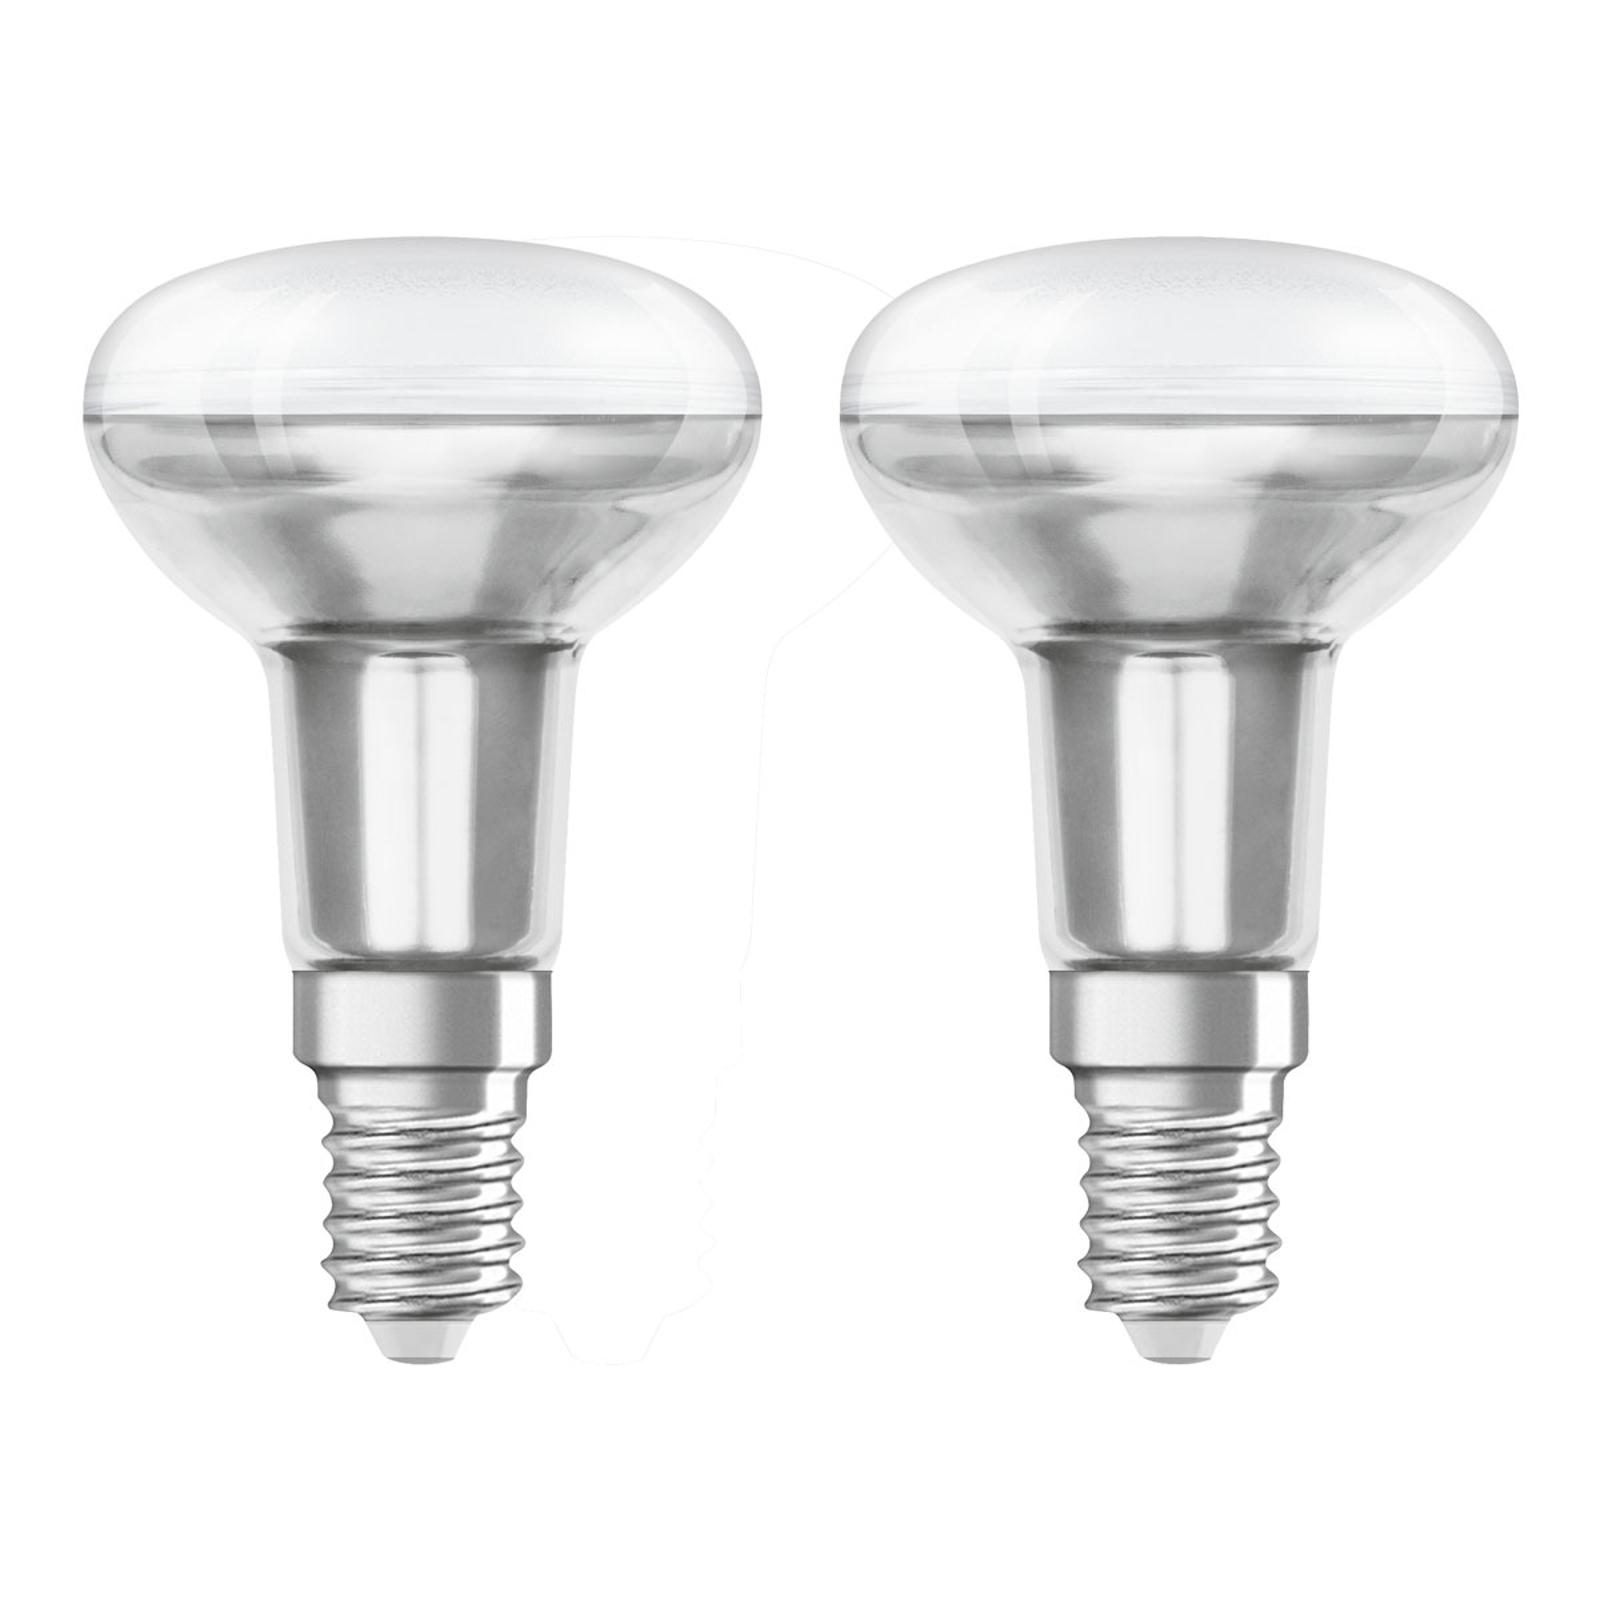 OSRAM reflektor LED E14 R50 1,6W 2700K 2 szt.